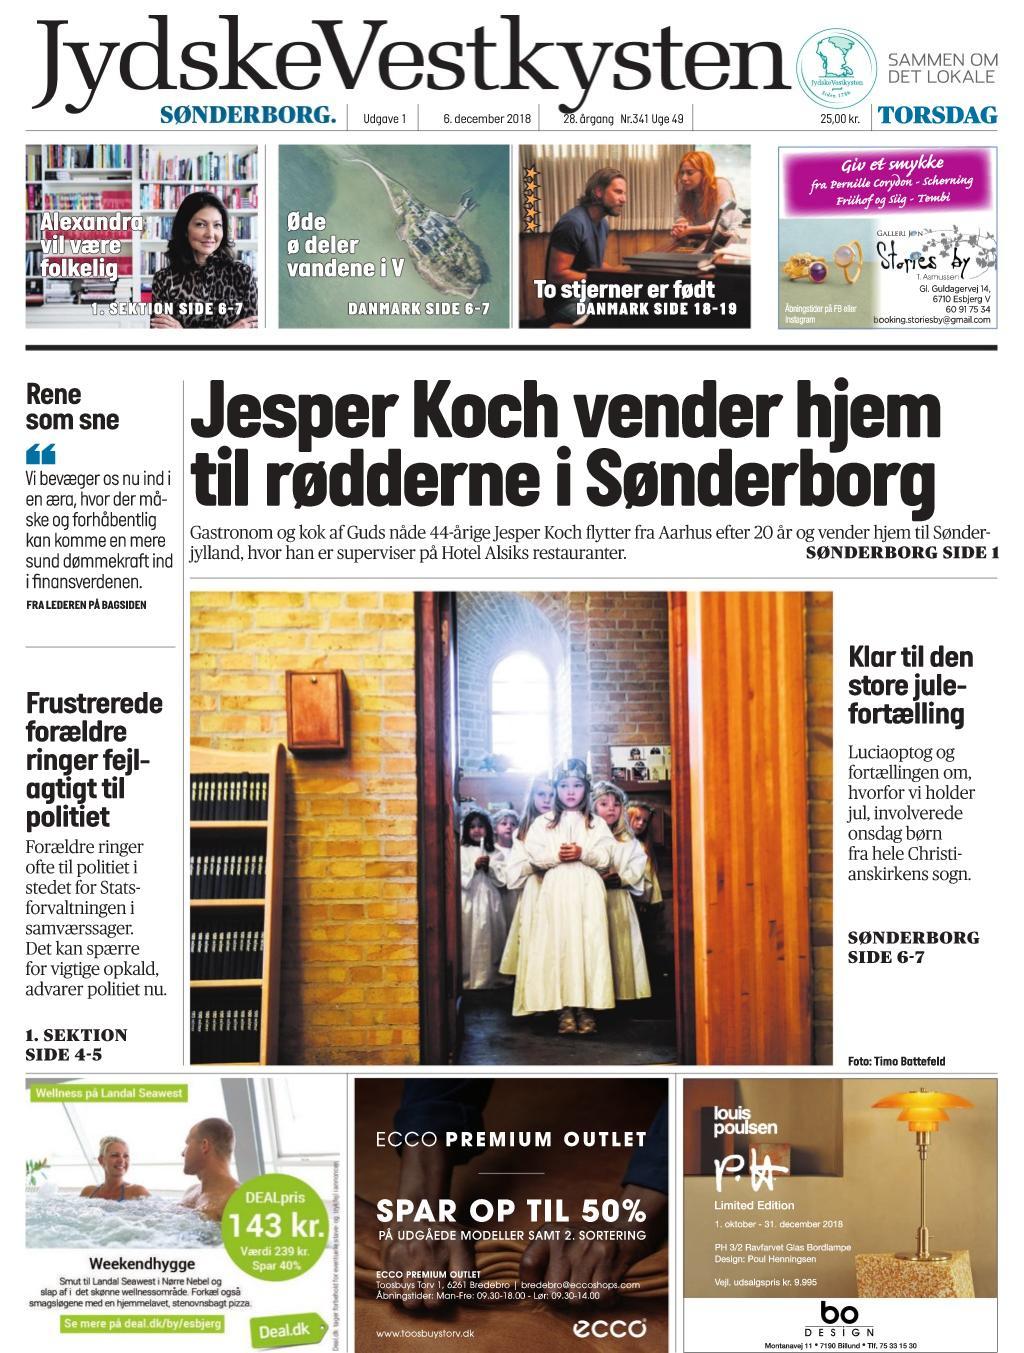 JydskeVestkysten Sønderborg – 06  december 2018 / AvaxHome